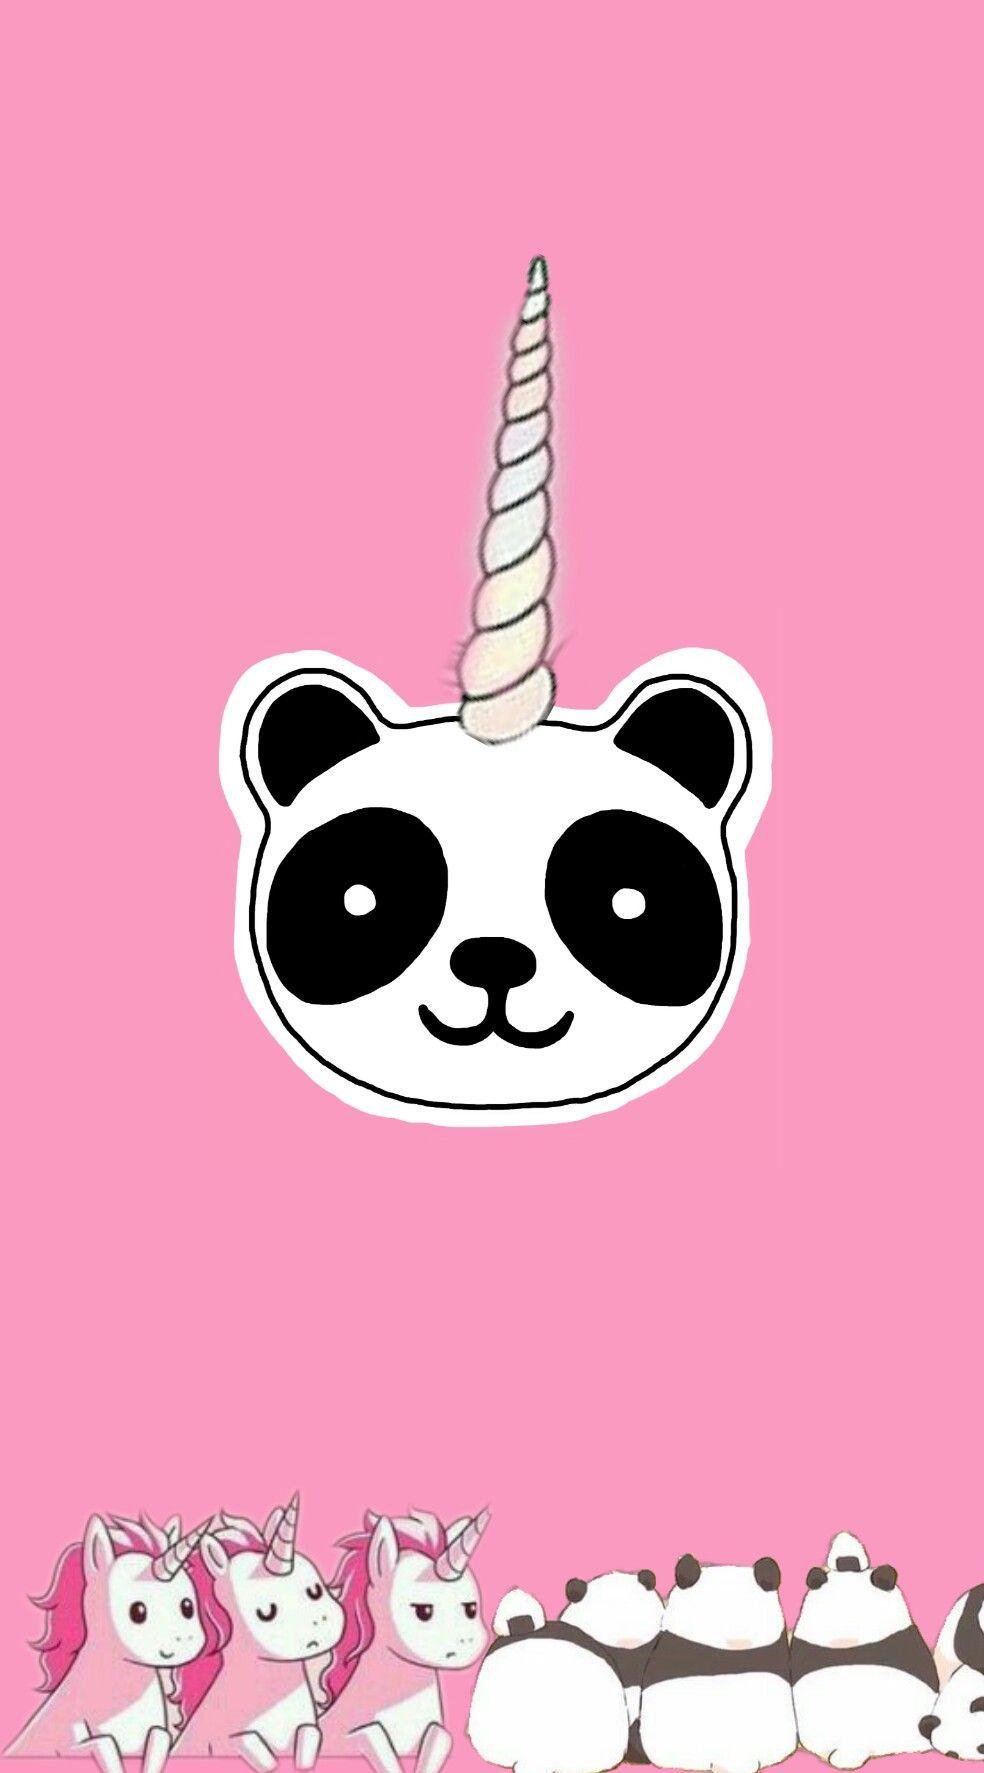 Photo By Queemerdaein Freetoedit Wallpaper Panda Unic Pandacorn Cute Doodles Cute Panda Wallpaper Panda Party